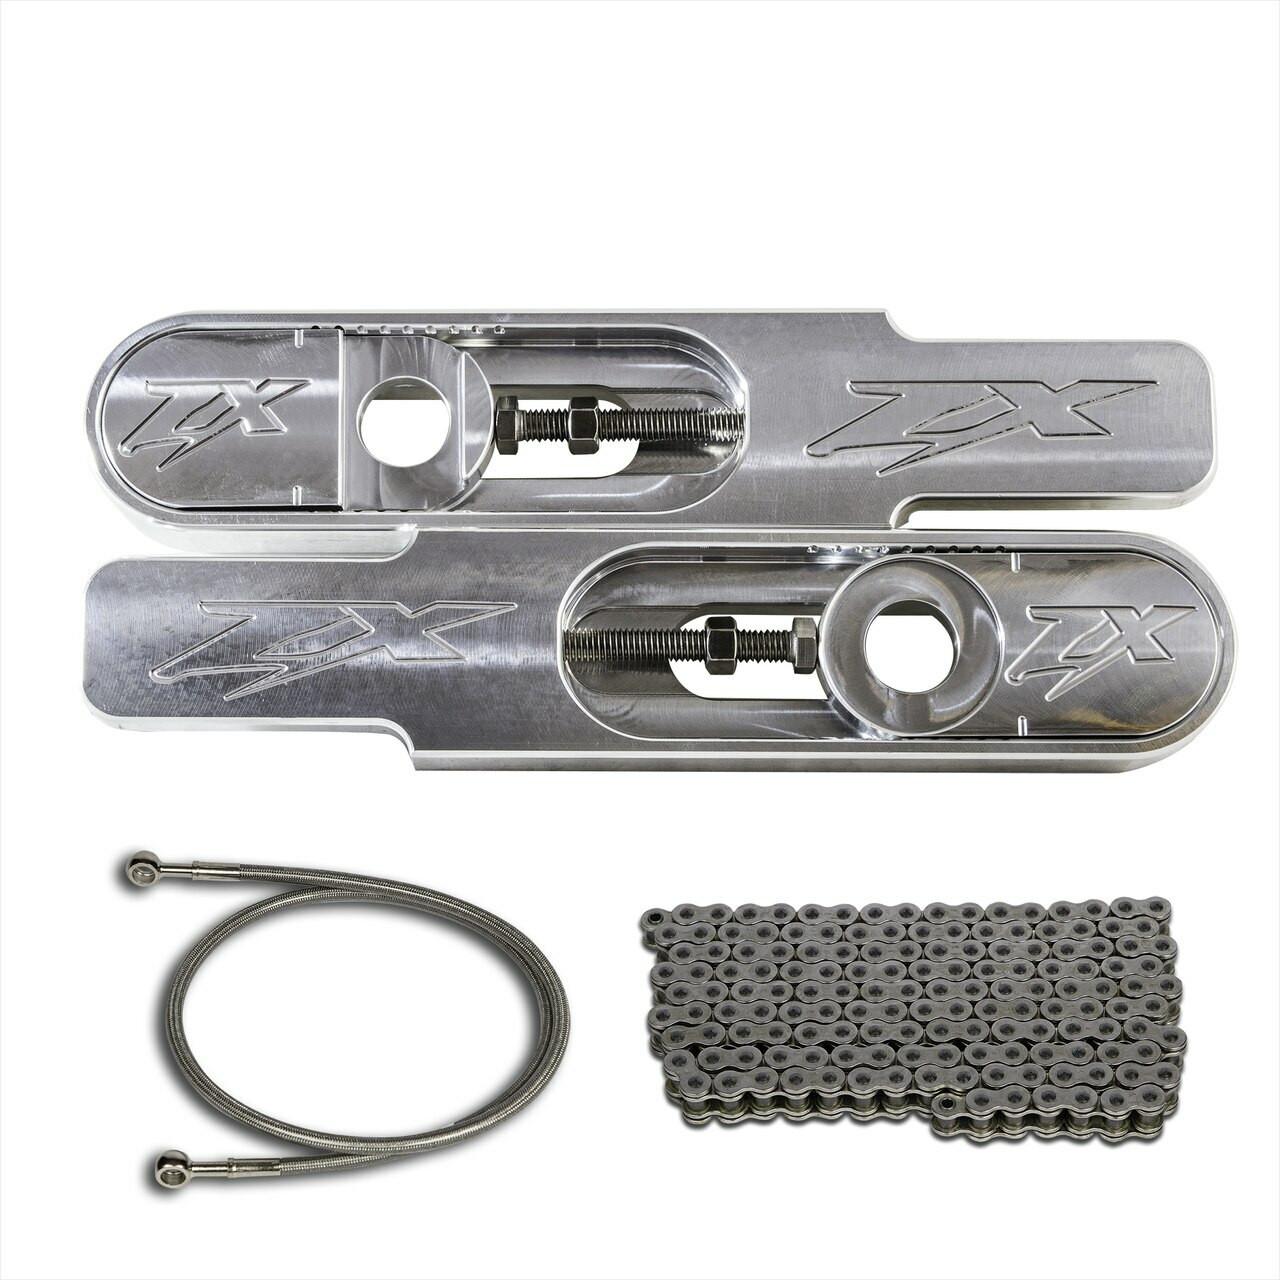 Kawasaki Ninja ZX-14R Swingarm Extension Kit